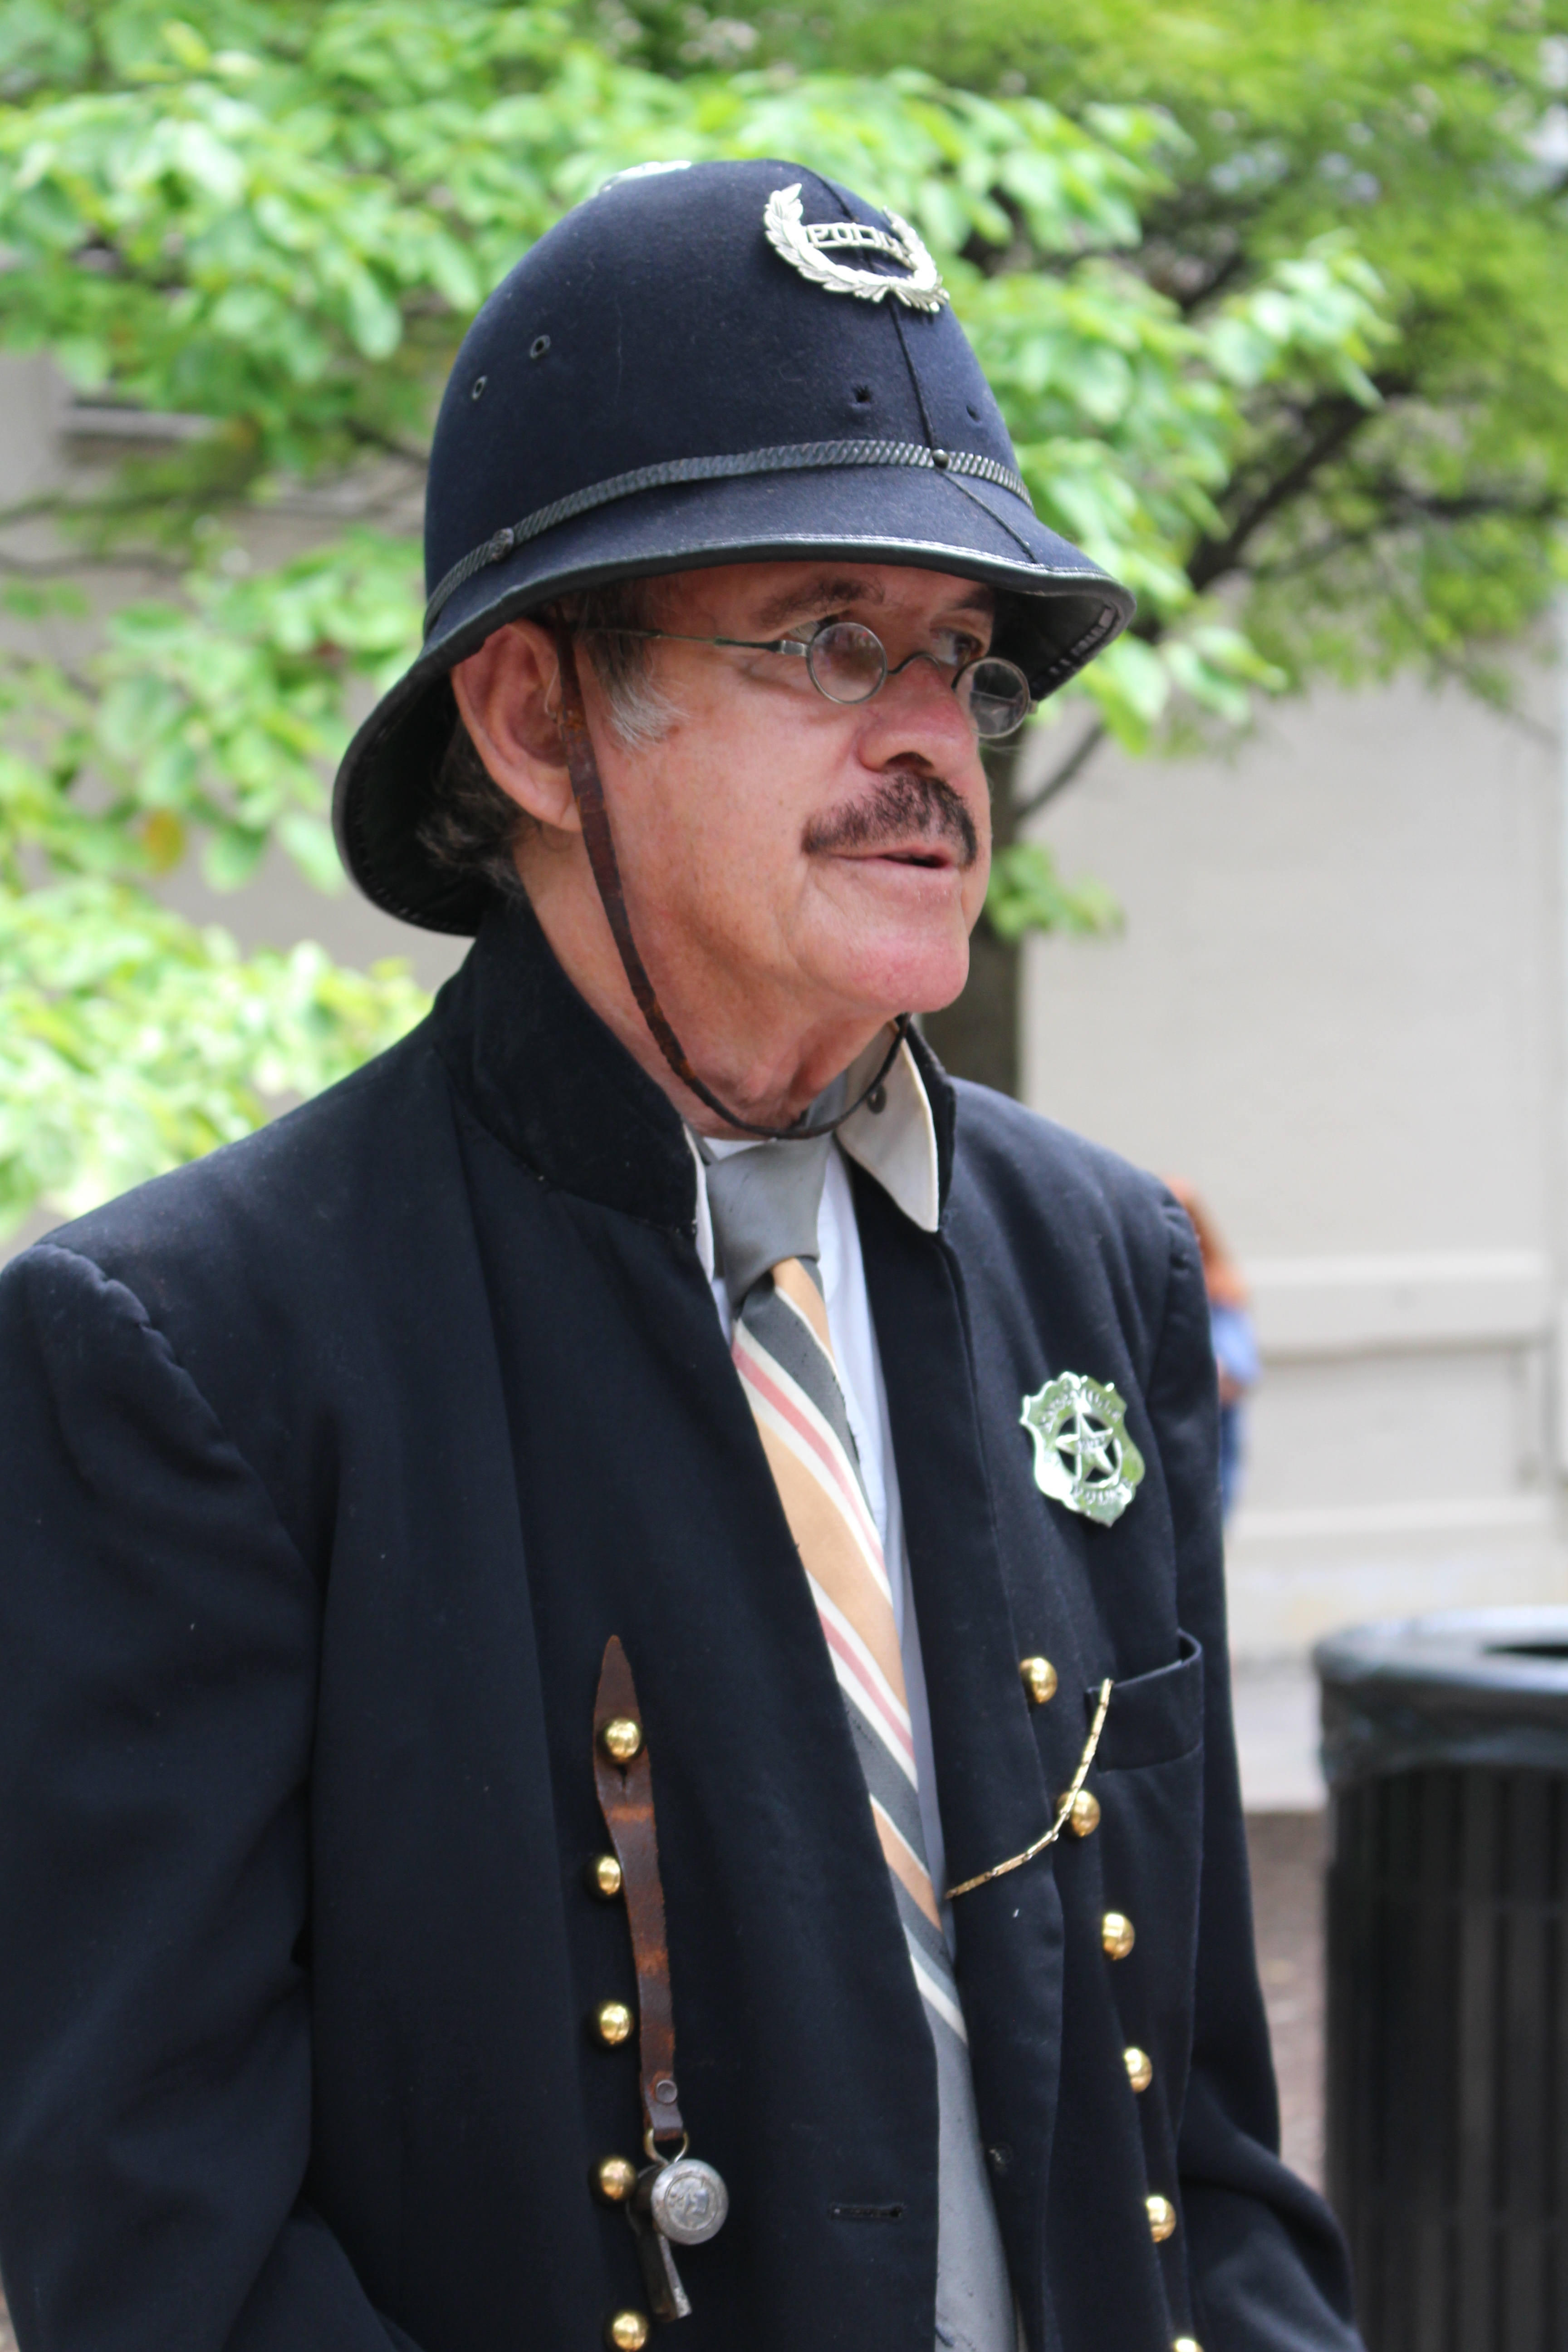 Constable Hat